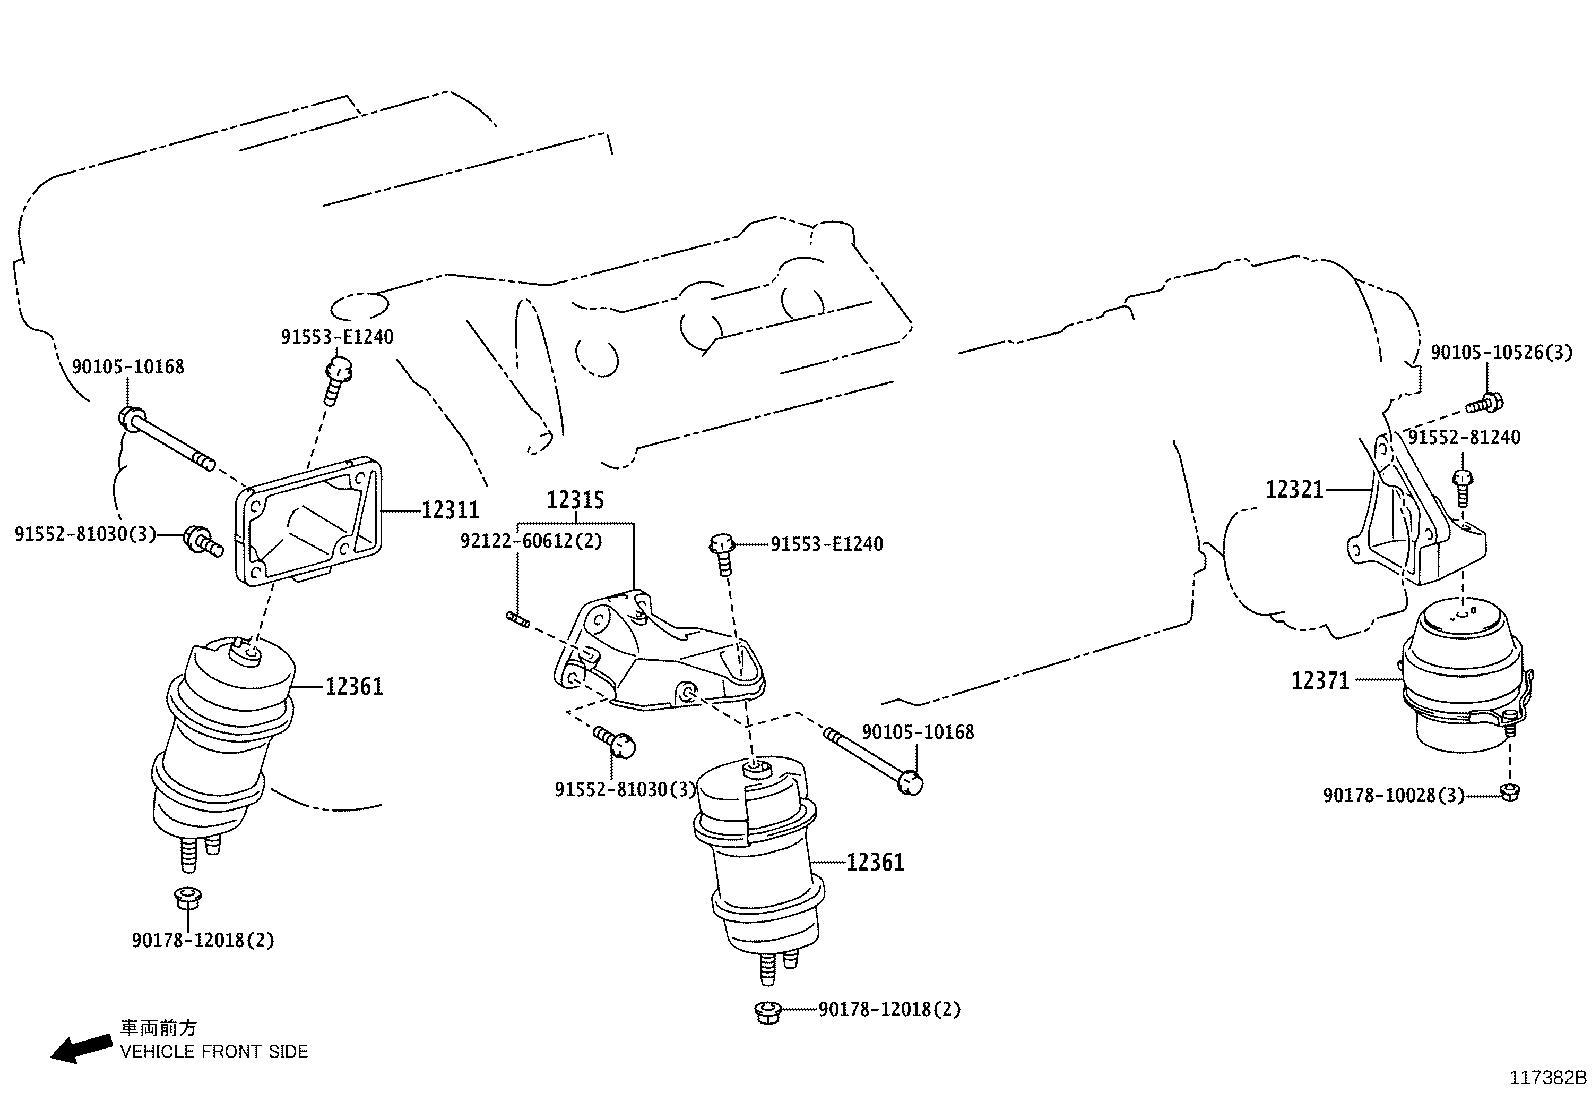 Lexus GS 350 Insulator, engine mounting, rear no. 1